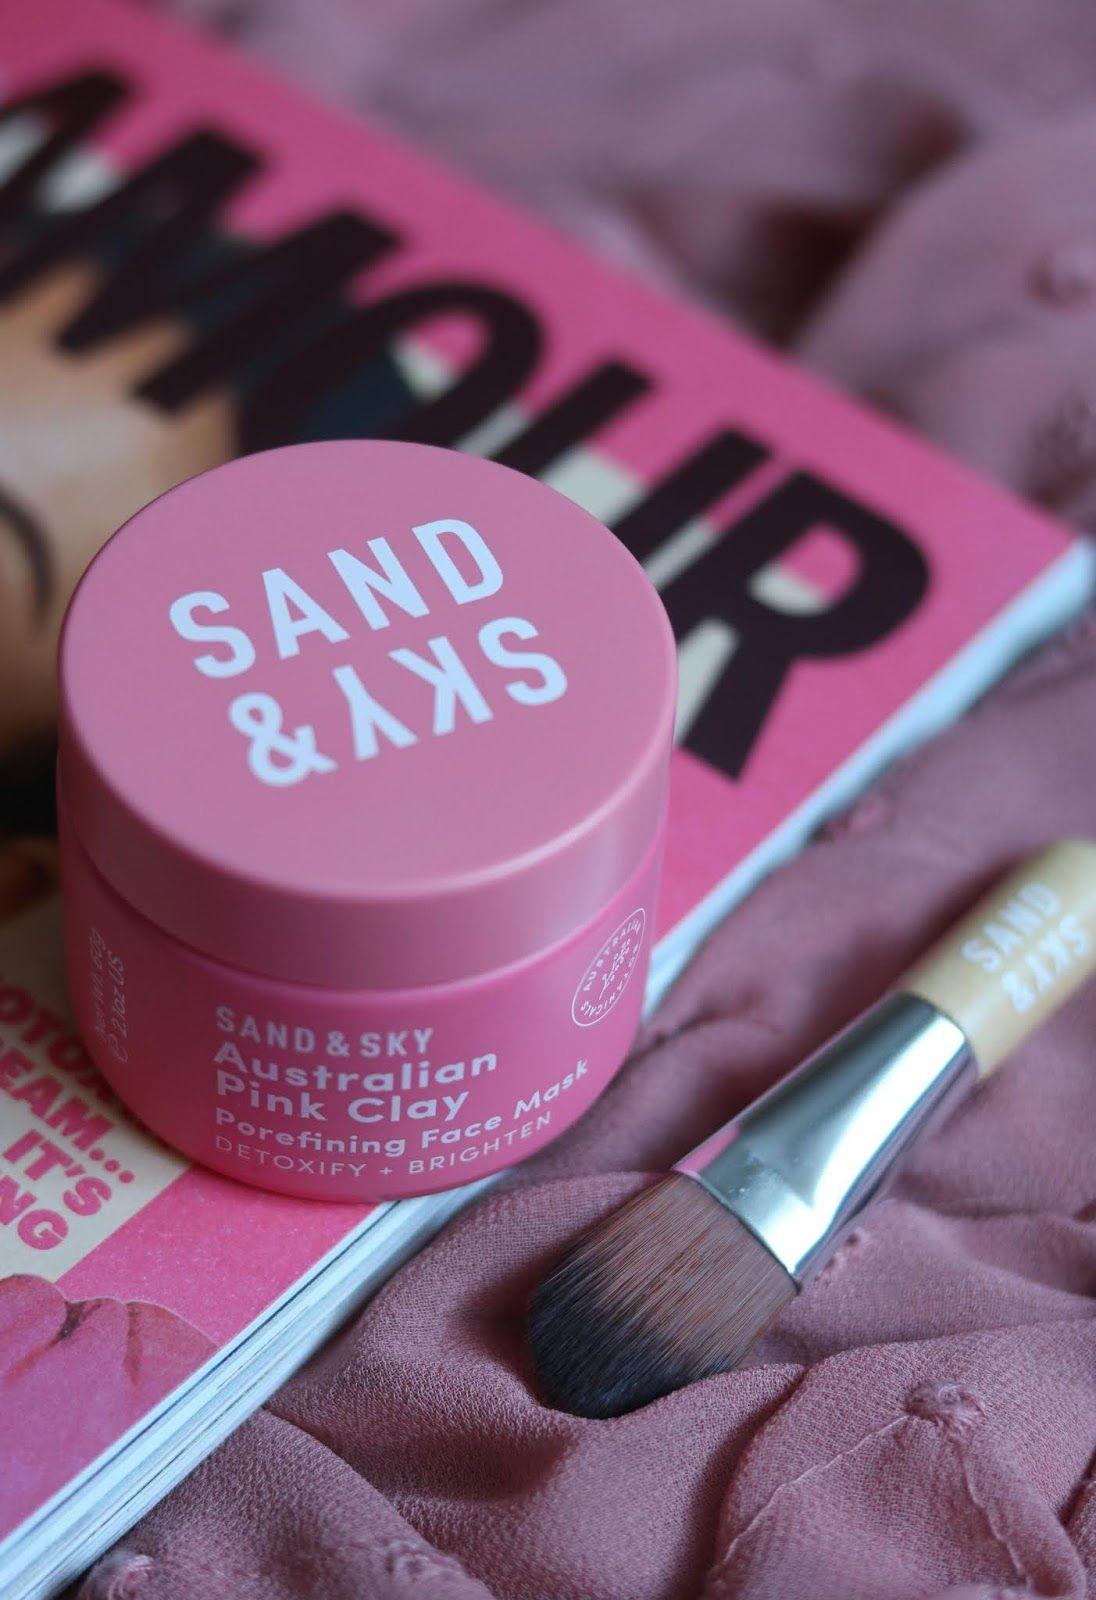 Sand & Sky Australian Pink Clay Mask Gesichtsmaske